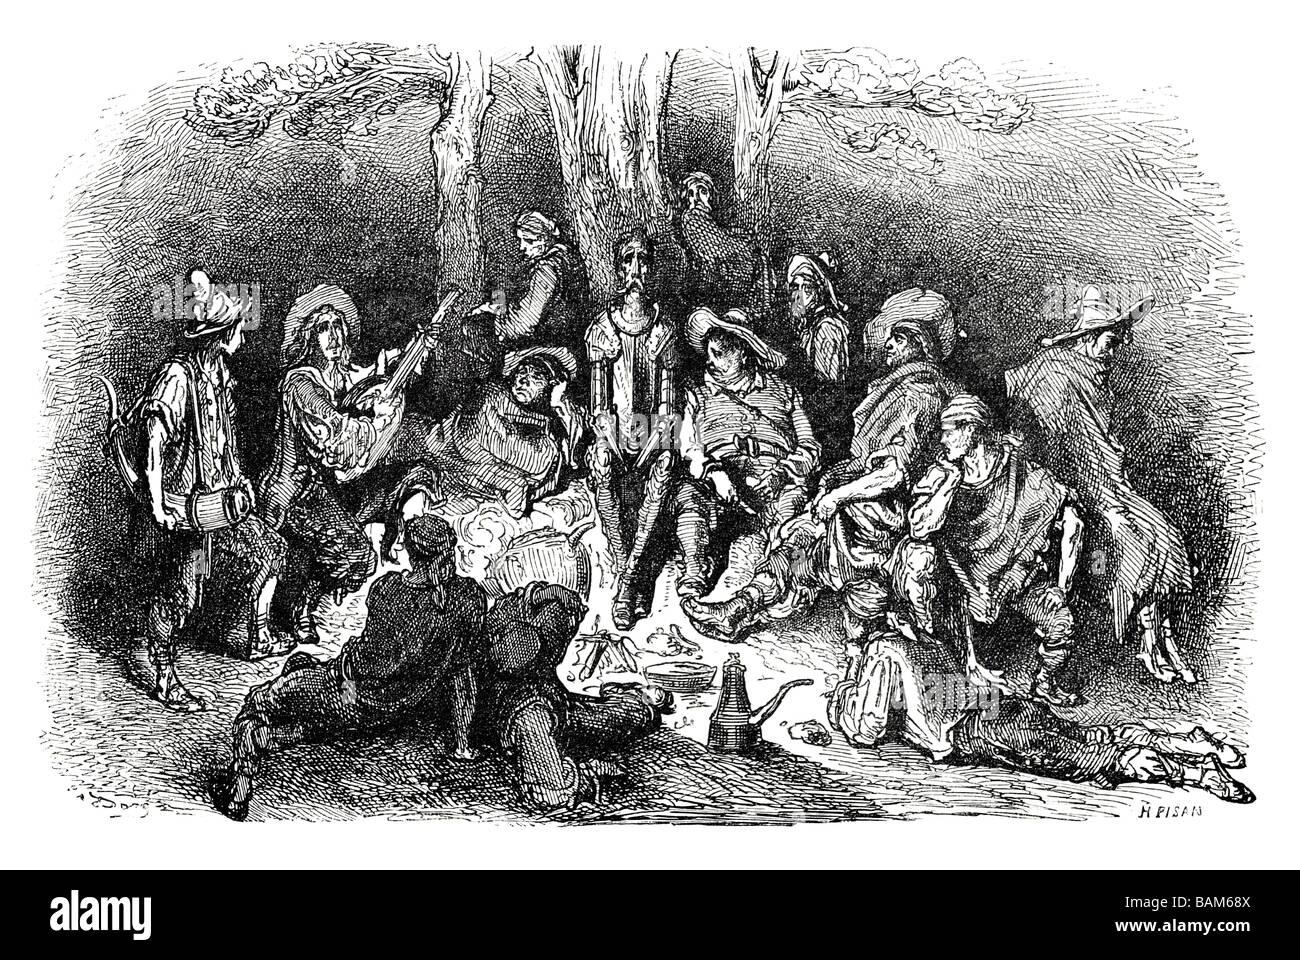 chapter XI 11 eleven Don quixote spanish novel Alonso Quixano Cervantes literature quest Stock Photo